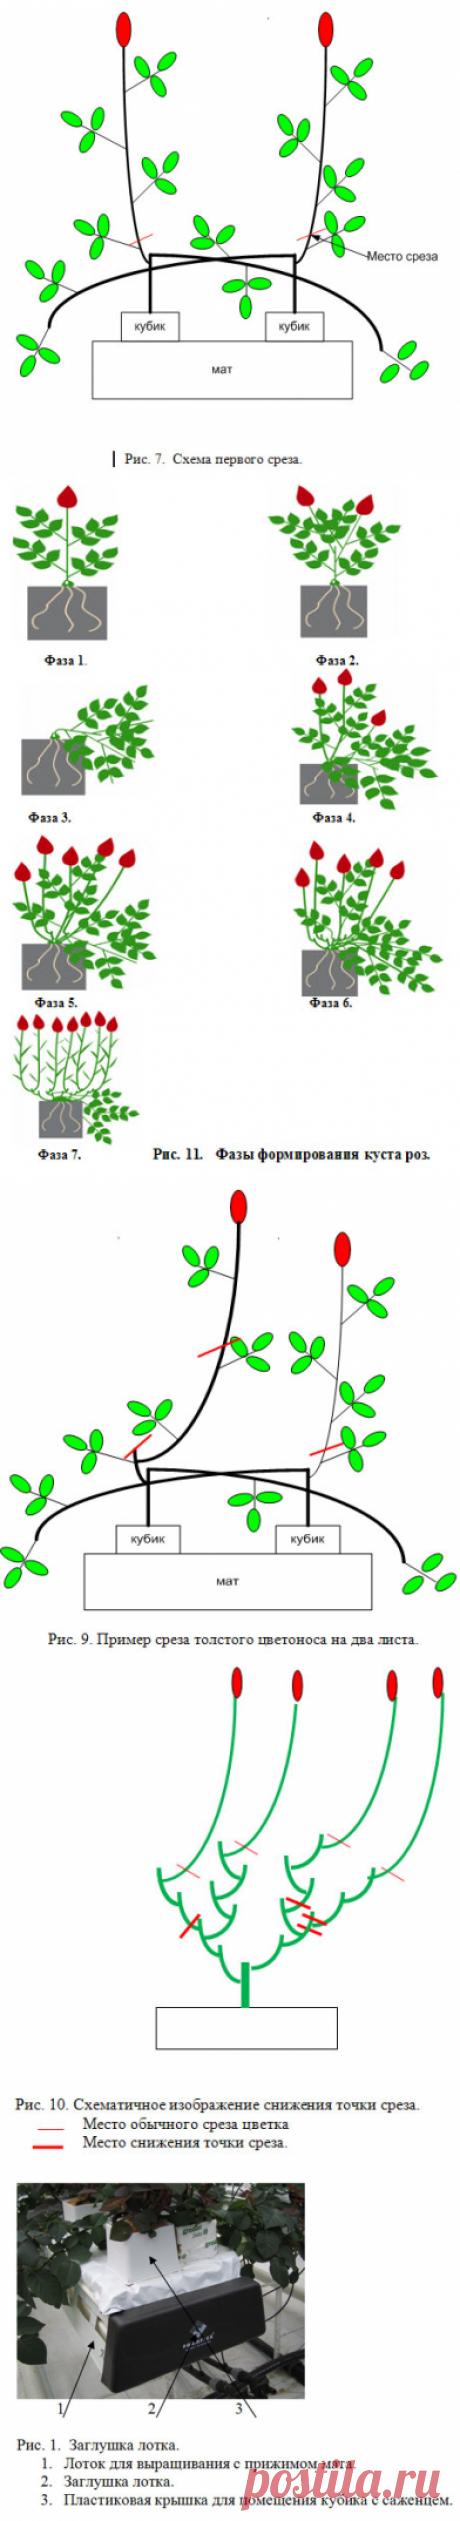 Выращивание роз на срез - Технологии выращивания роз, срезка и хранение - Портал о теплицах